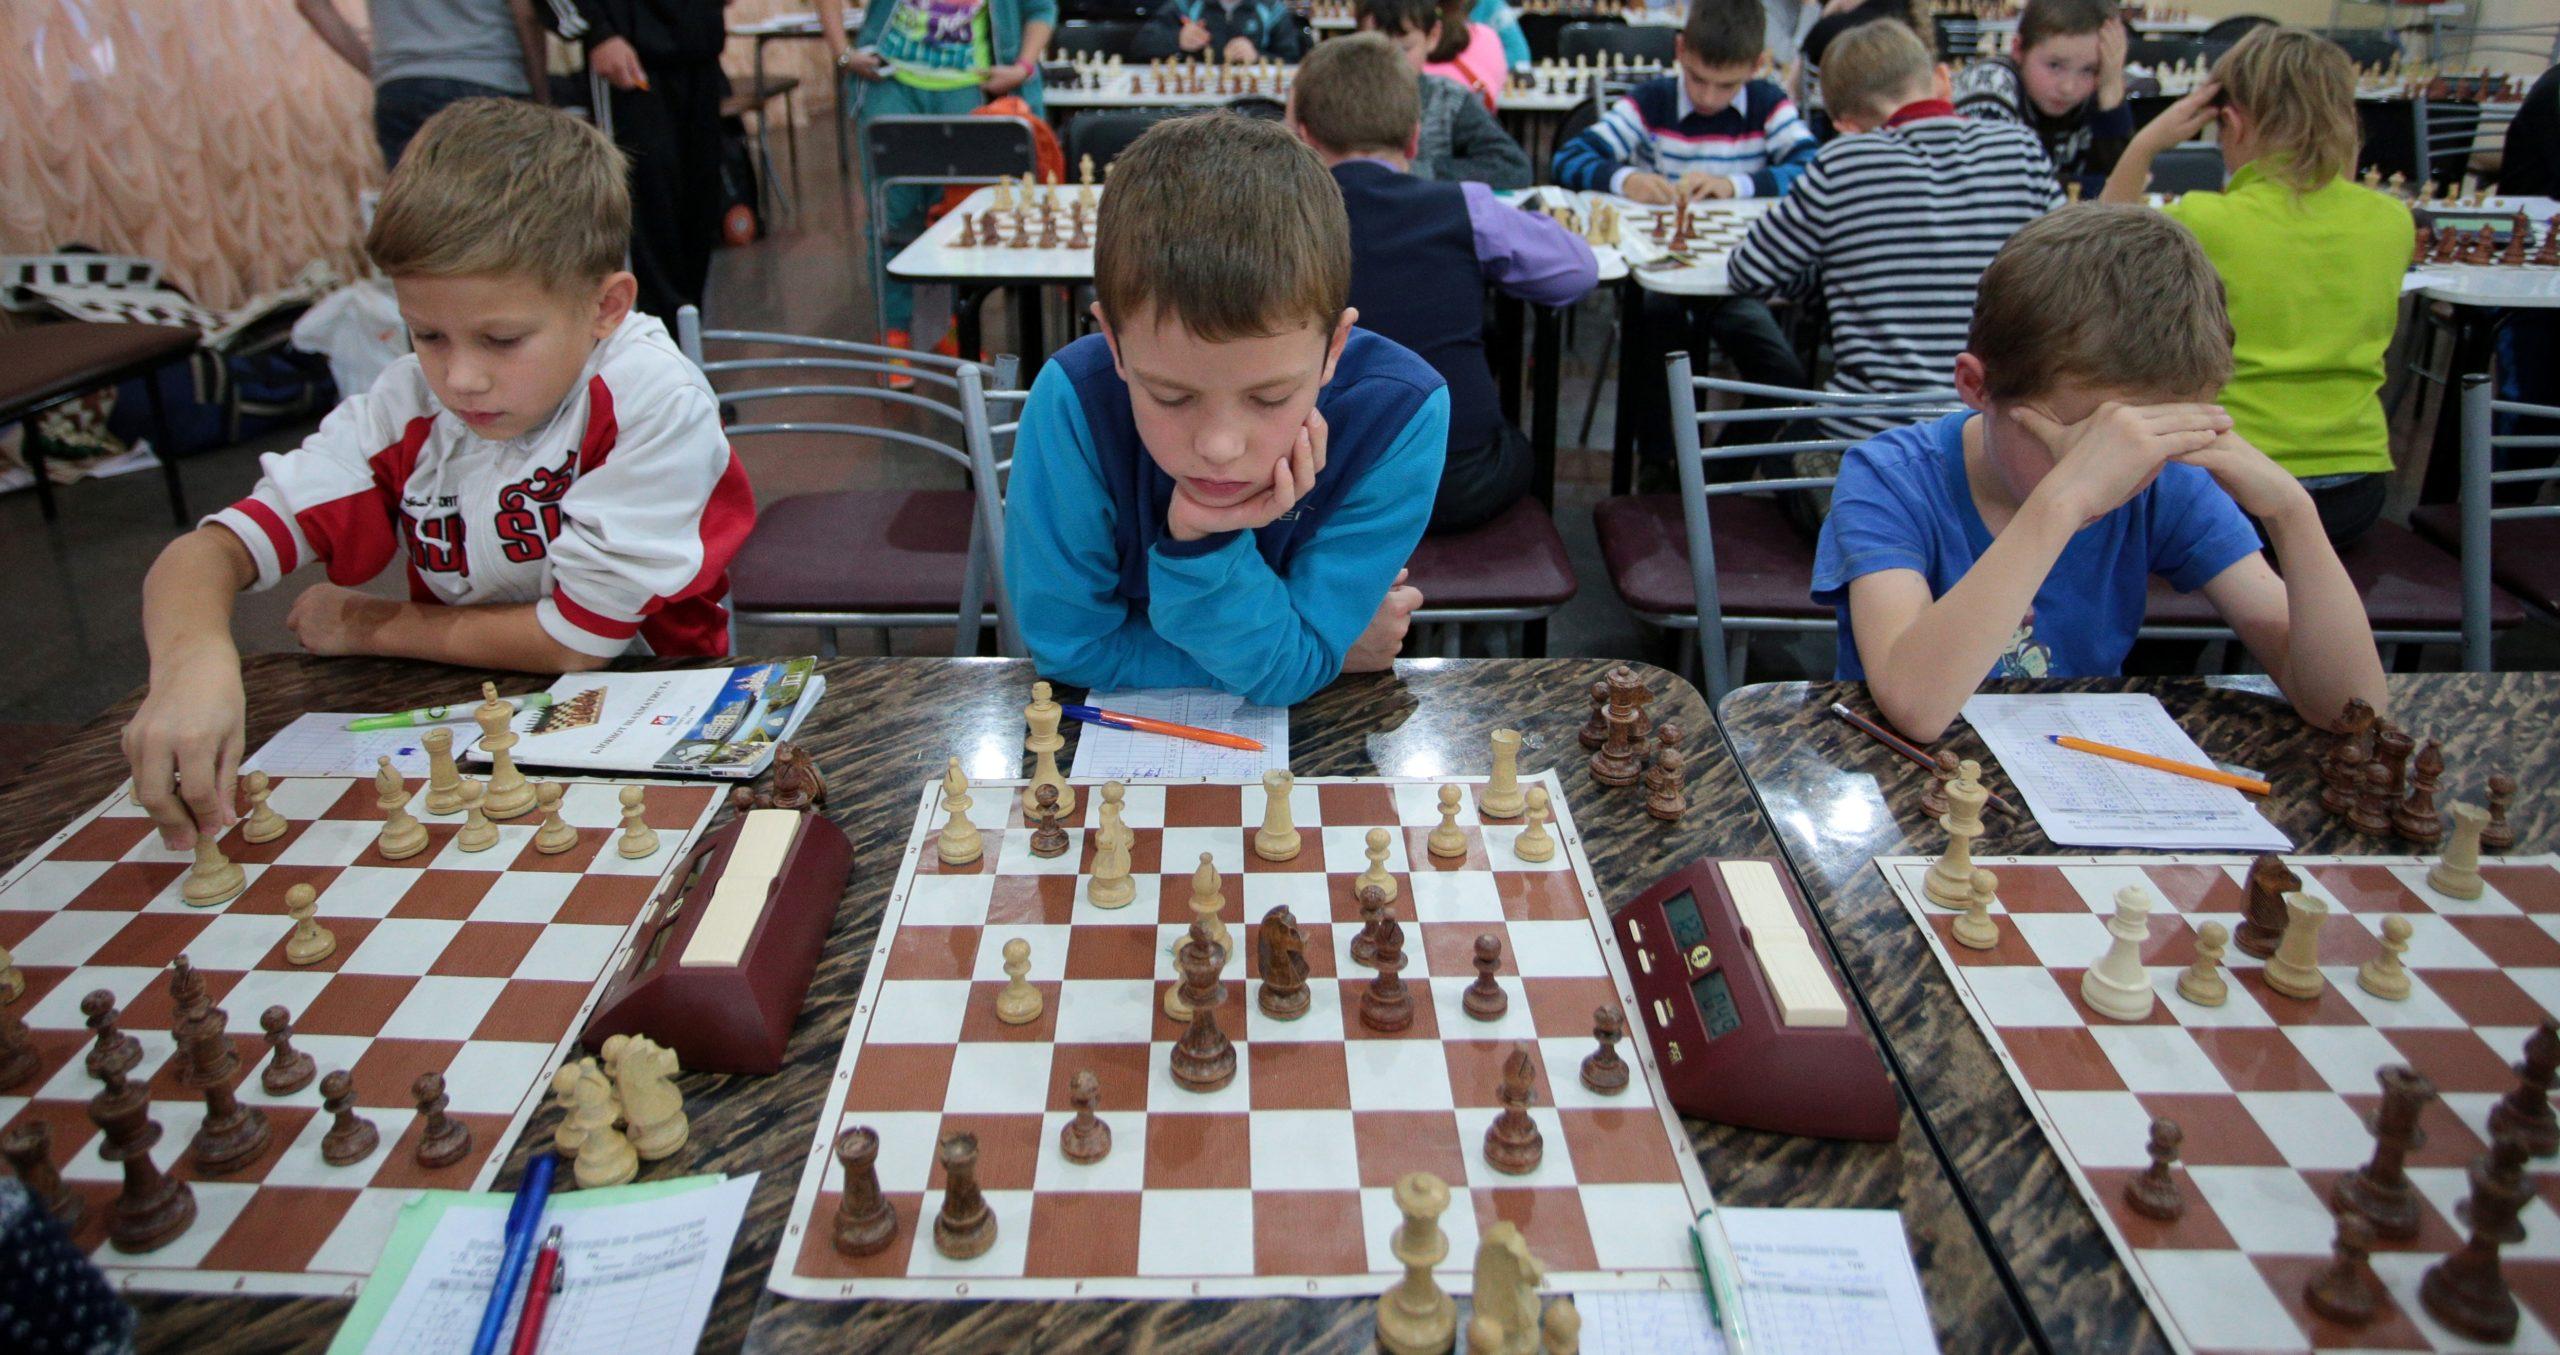 Анонс Областного турнира по шахматам «Приз Центра Ладога»